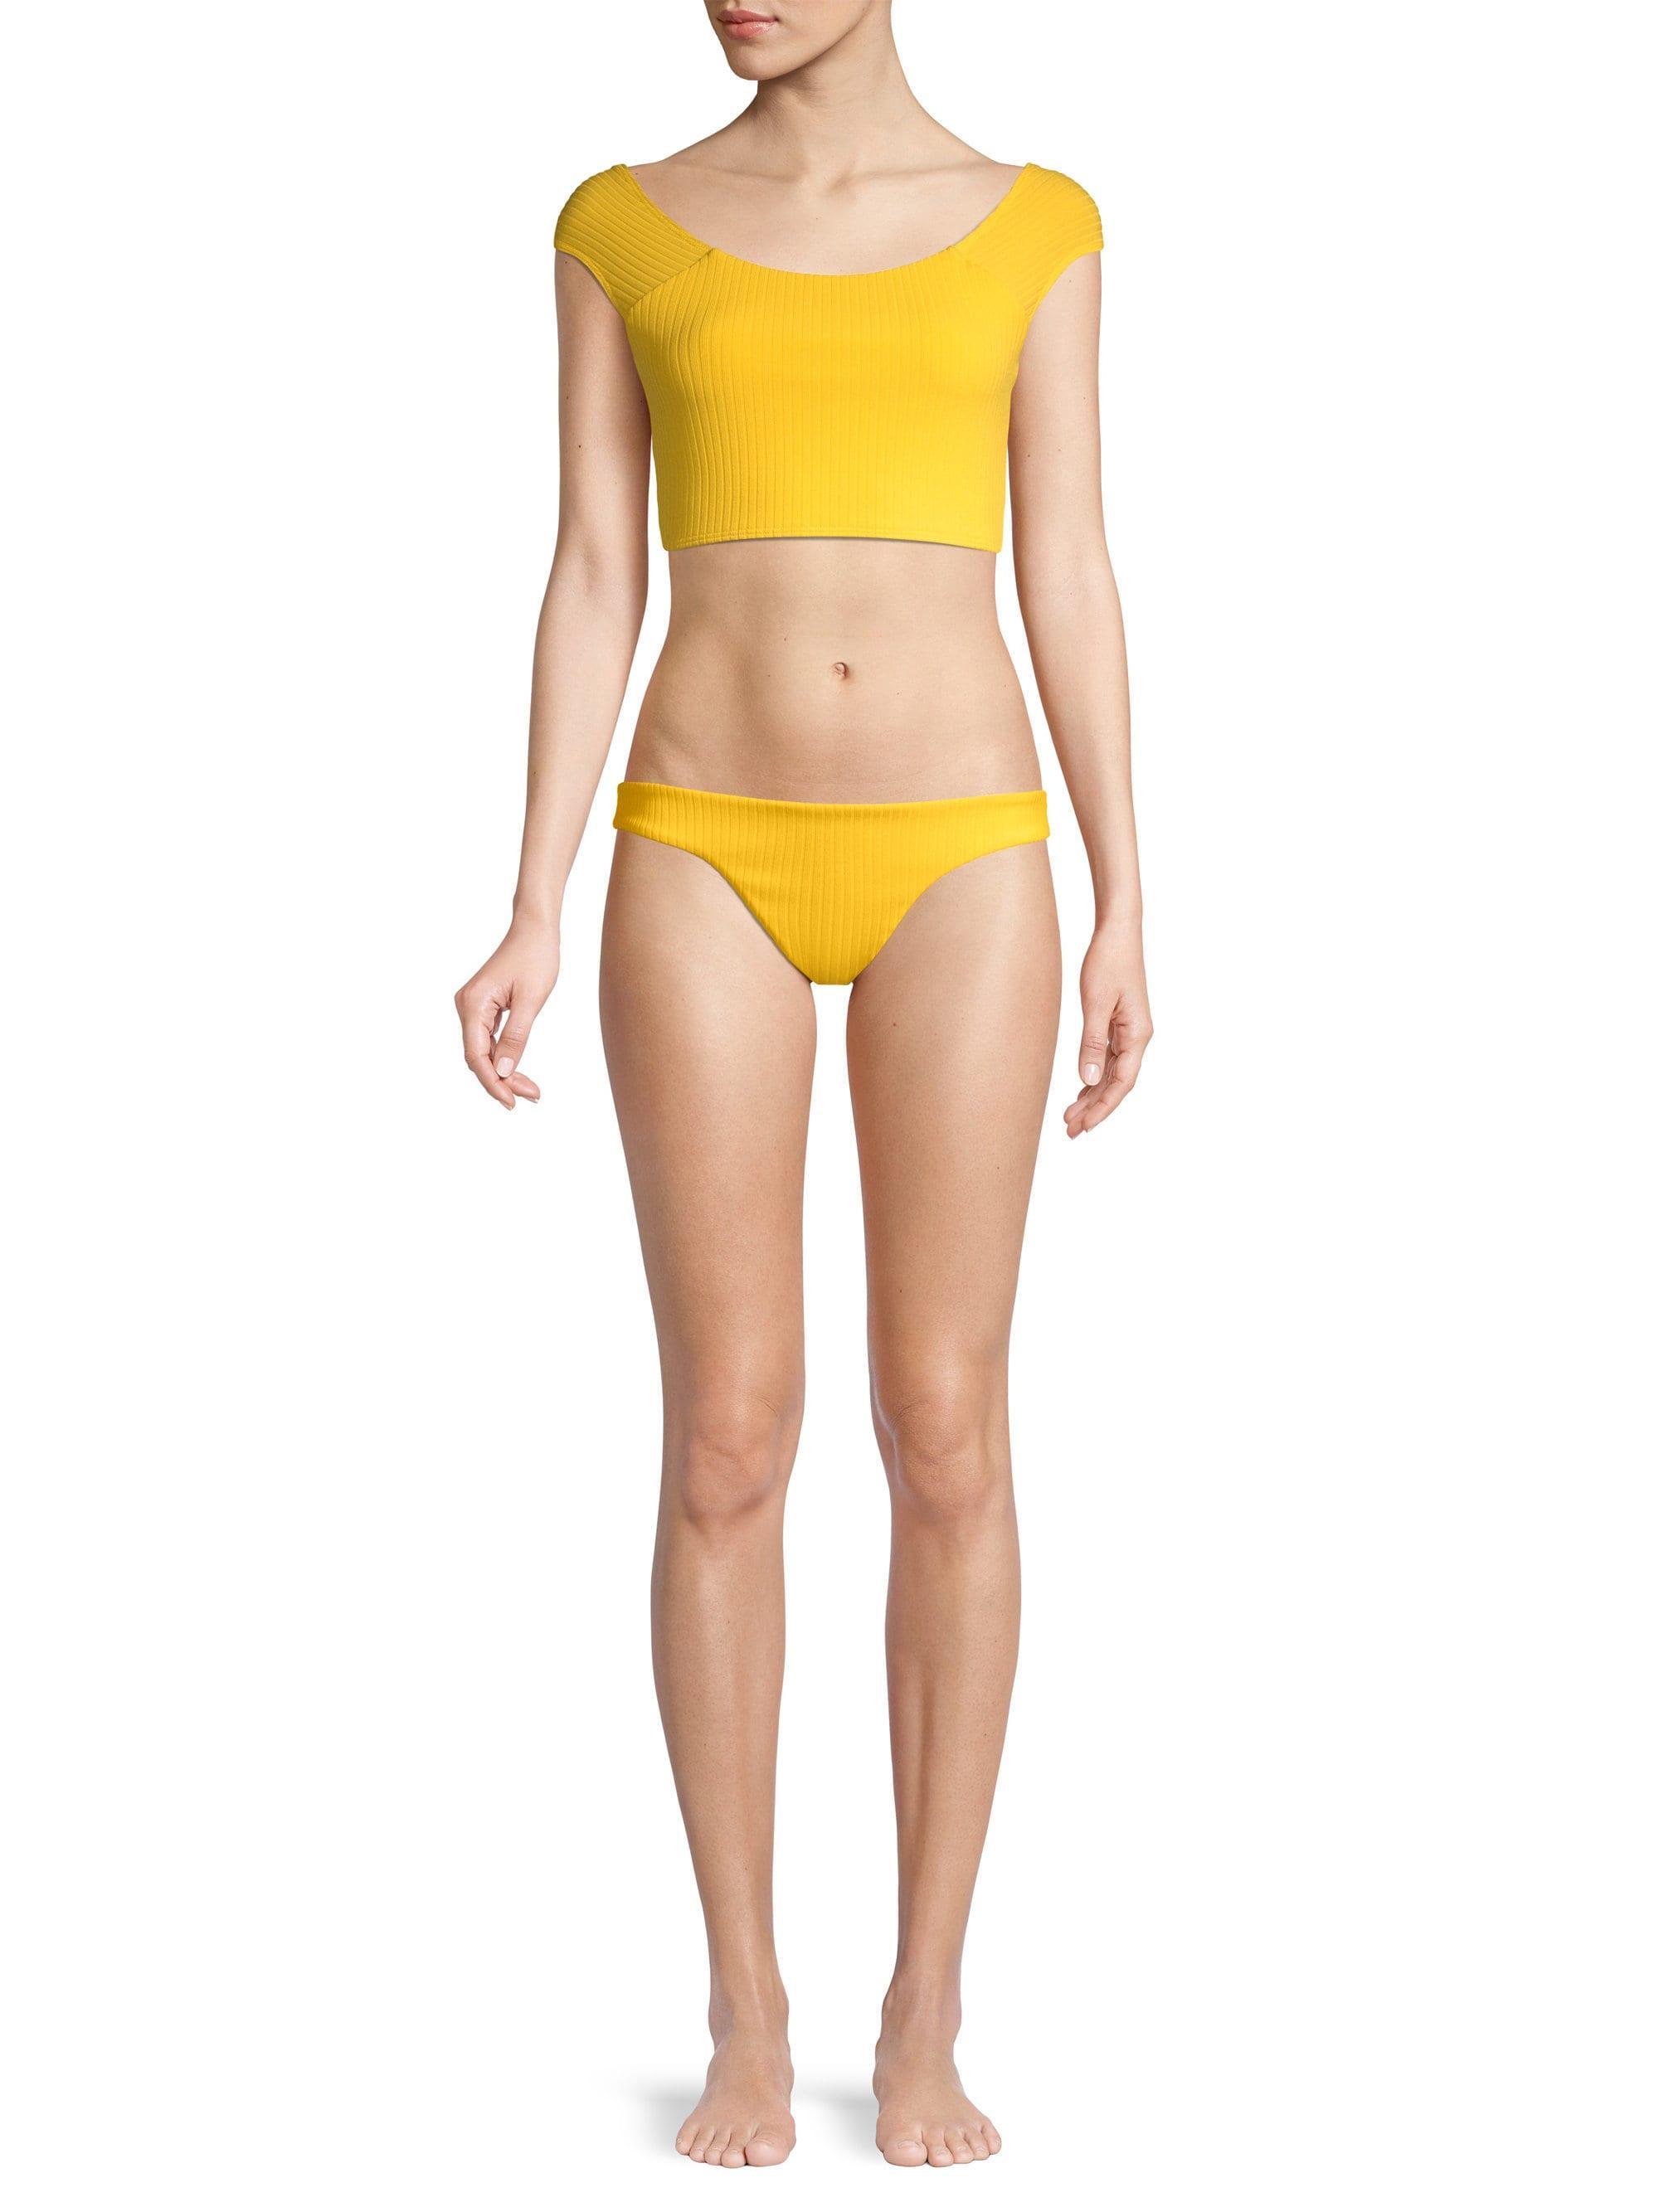 b483668a63 Mara Hoffman - Yellow Naomi Bikini Top - Lyst. View fullscreen